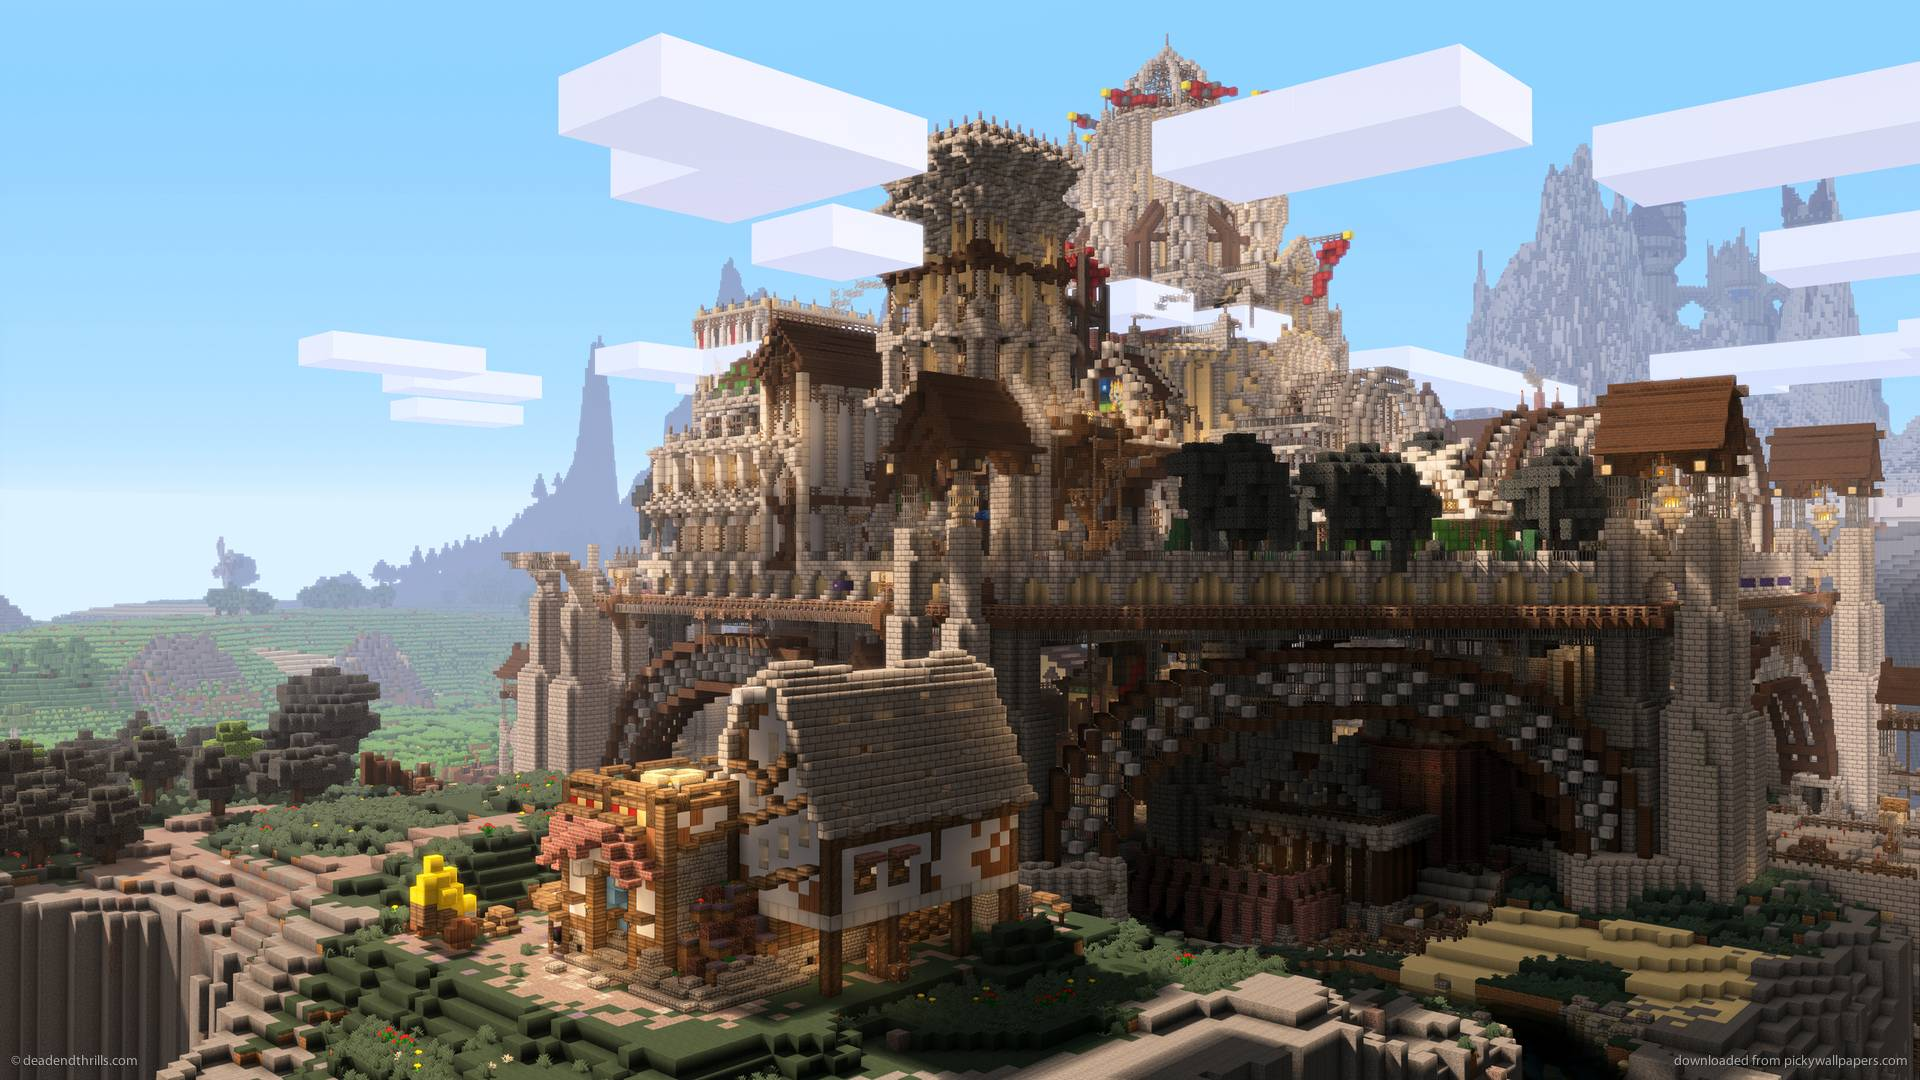 Minecraft Wallpapers 1920x1080 - Wallpaper Cave